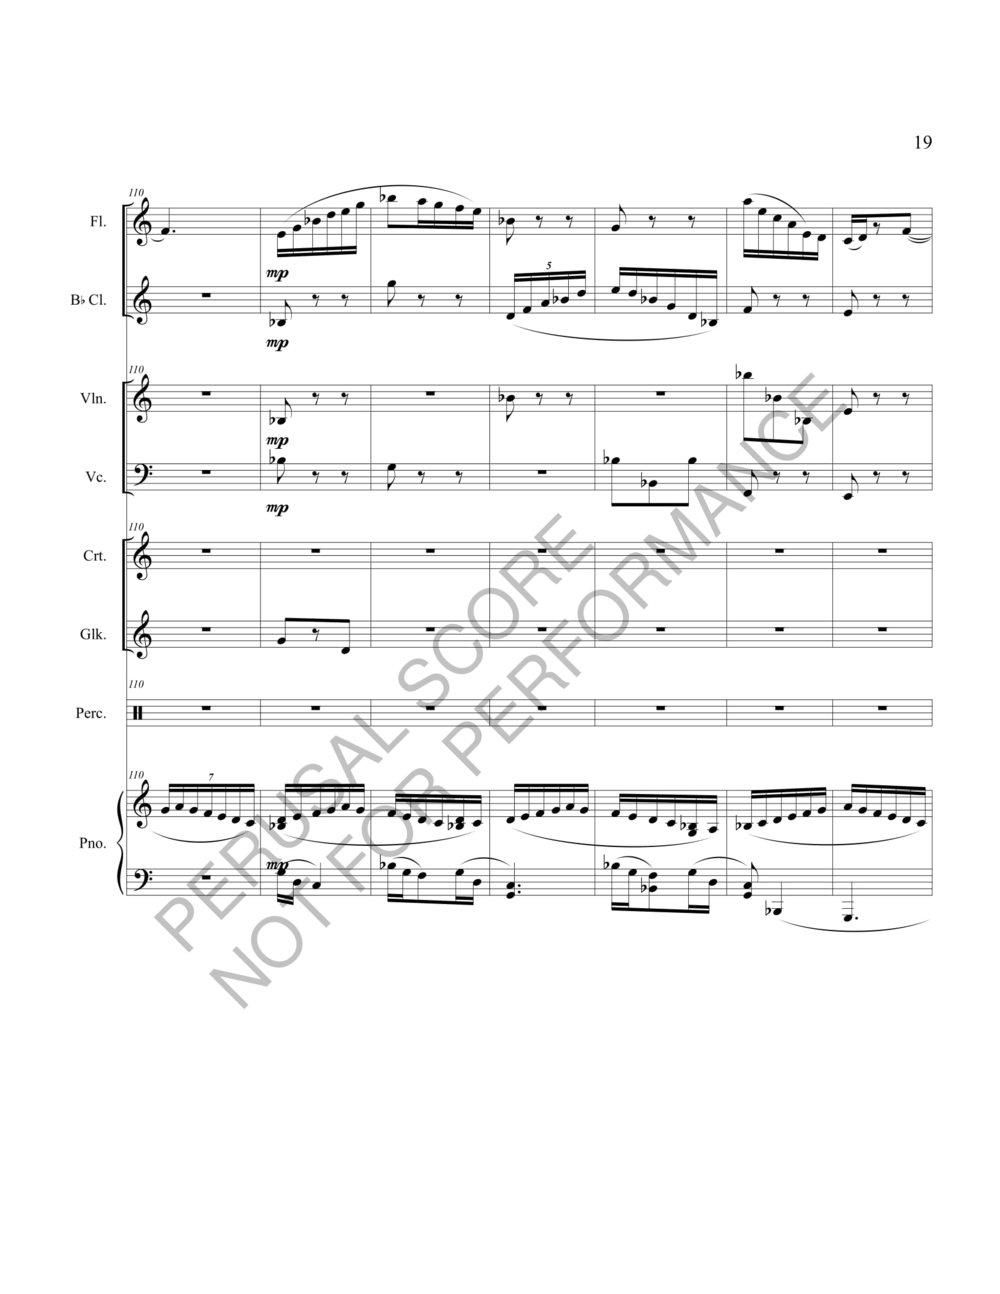 Boyd Terra Liberi Score-watermark-25.jpg